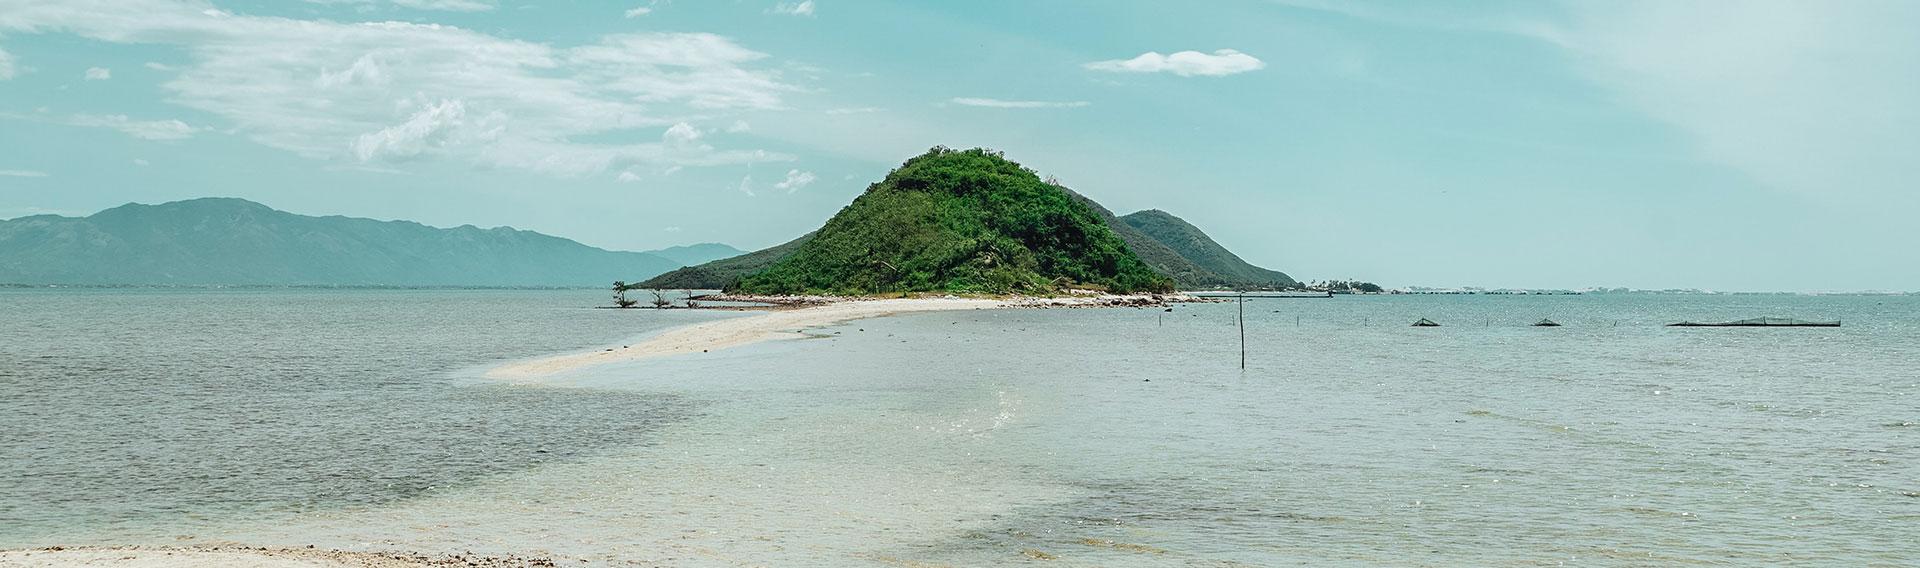 Vietnam, Con Dao, Beach